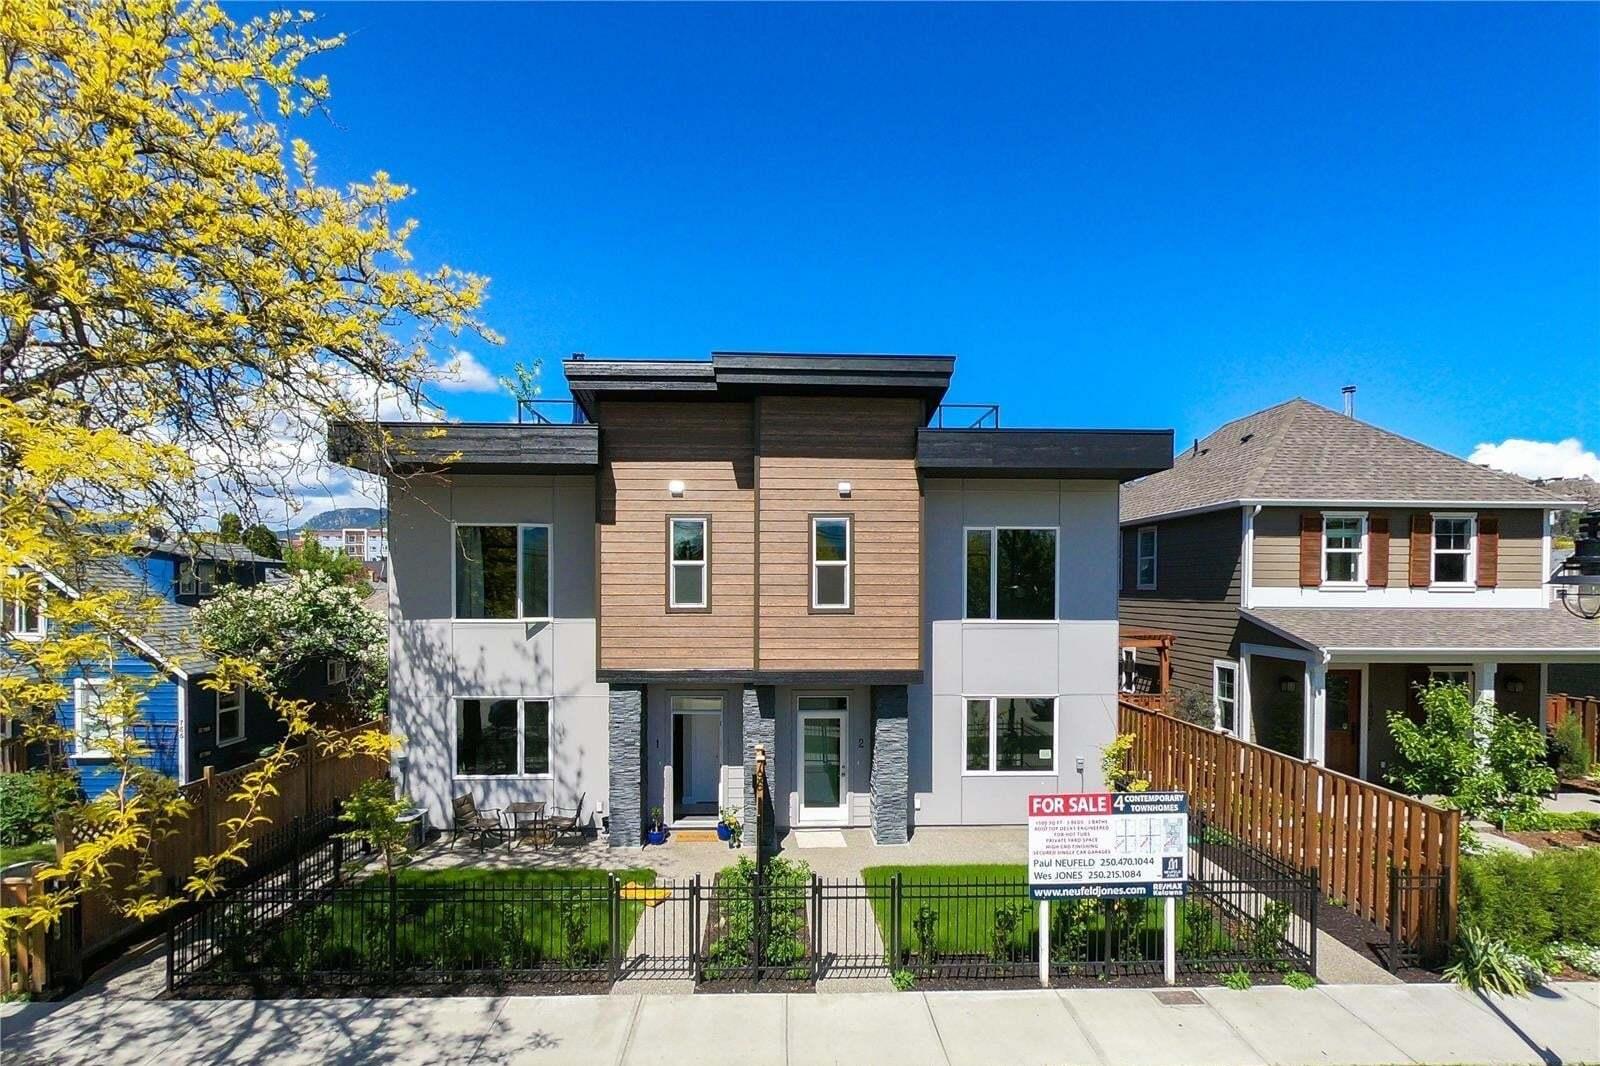 Townhouse for sale at 796 Cawston Ave Kelowna British Columbia - MLS: 10202159